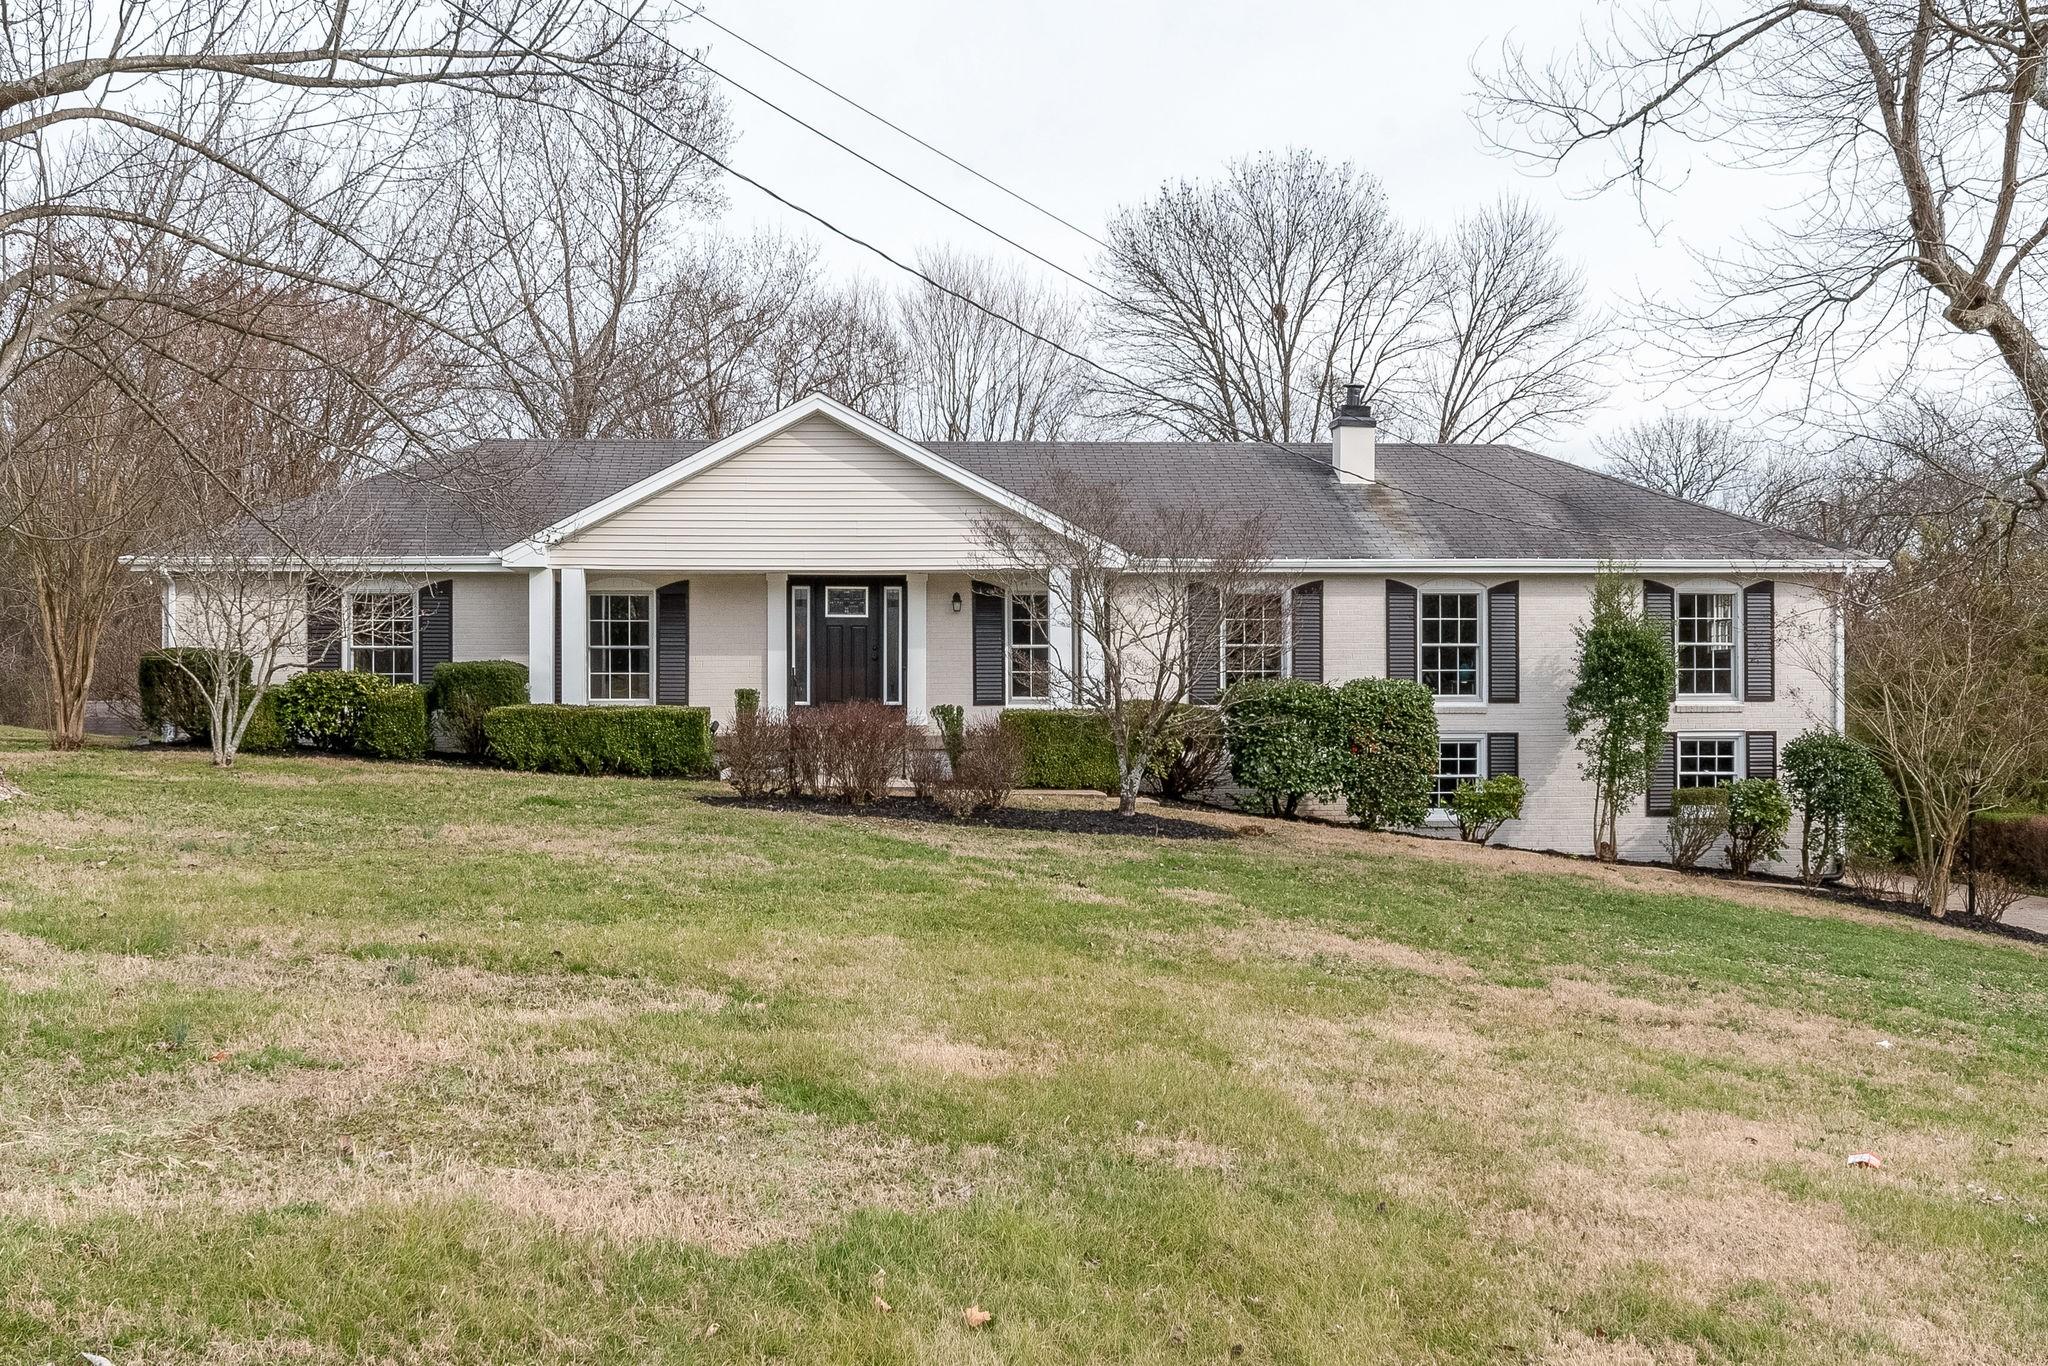 107 Country Club Dr, Hendersonville, TN 37075 - Hendersonville, TN real estate listing